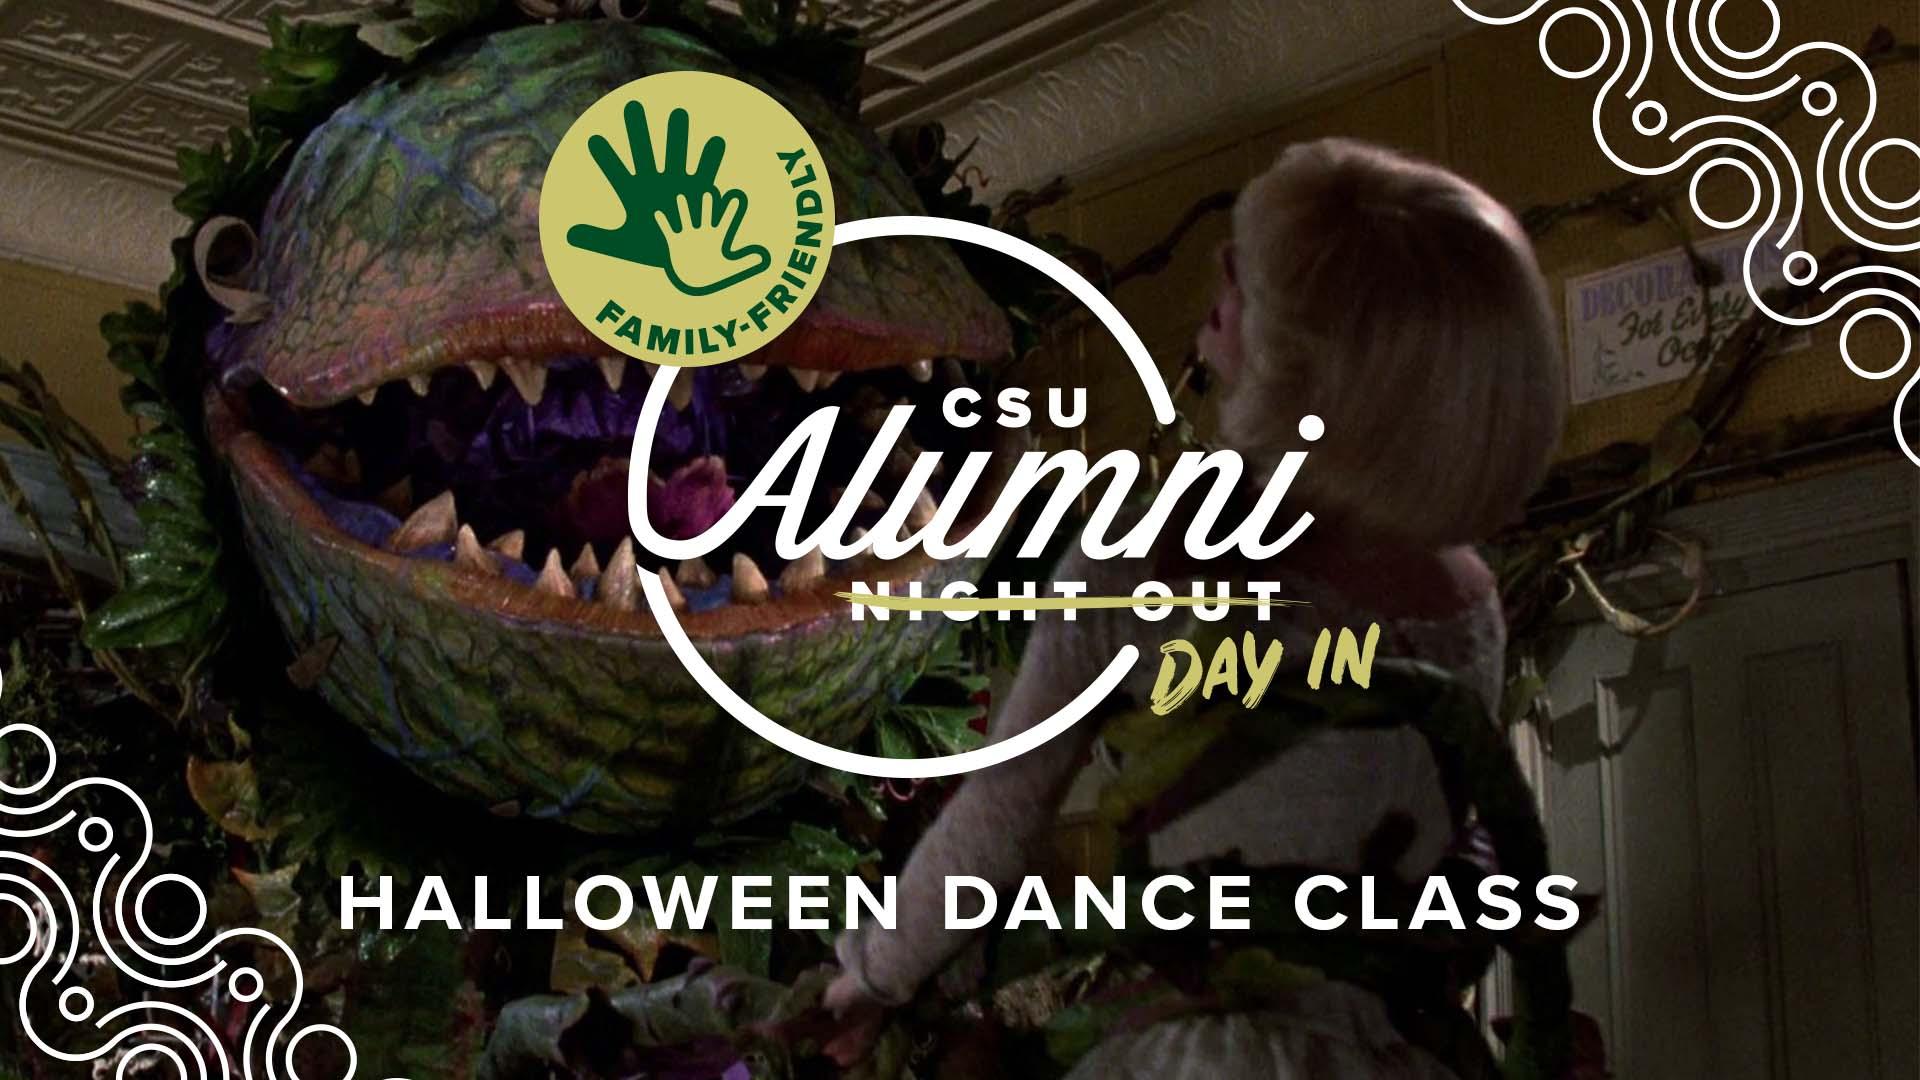 Image for Alumni Day In: Halloween Dance Class webinar